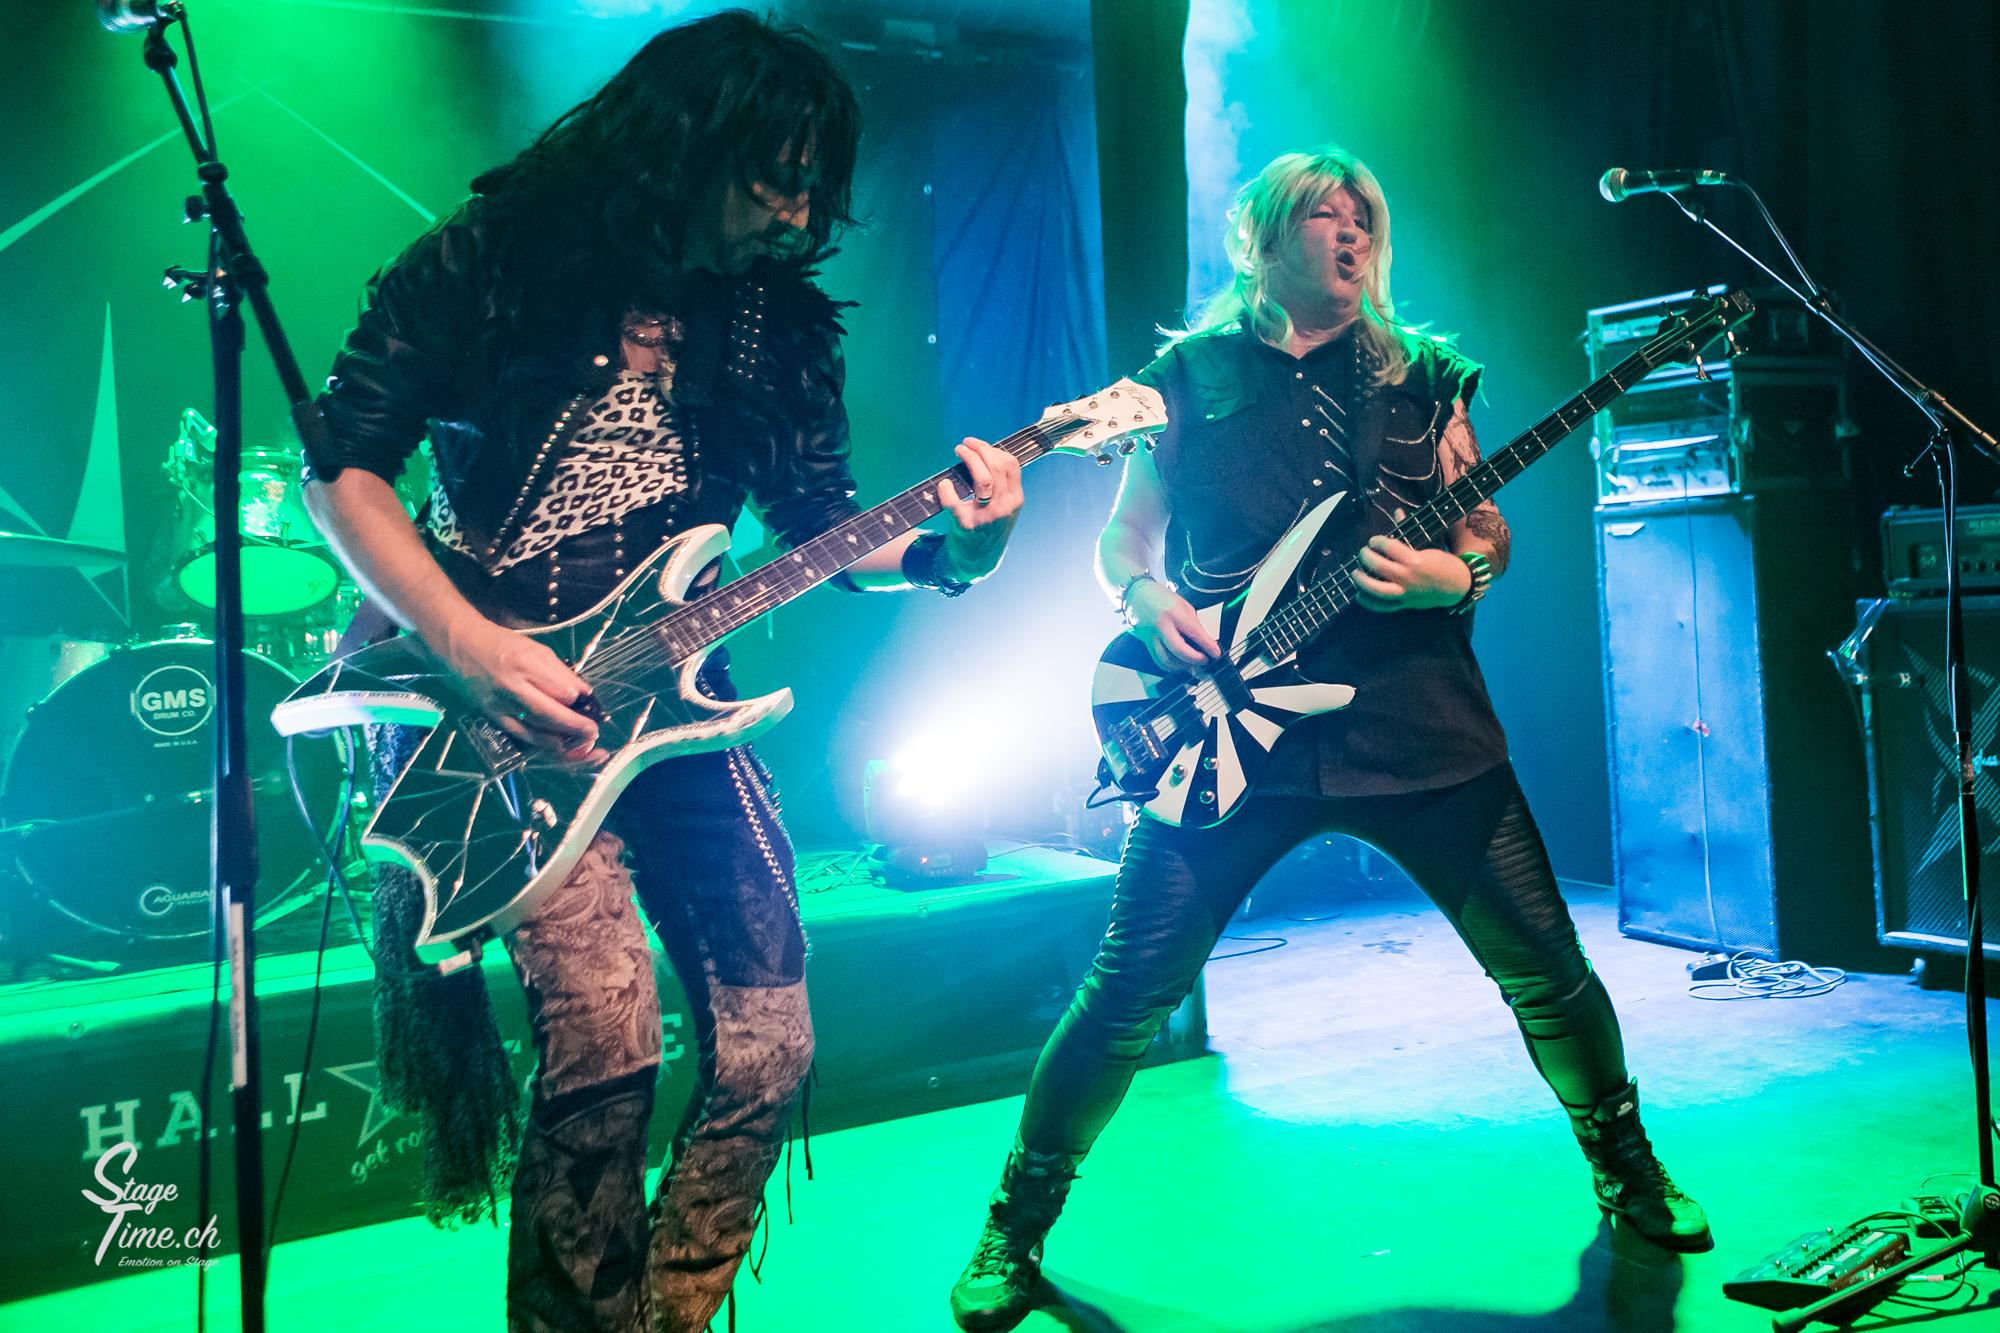 Van_Arx___1st_Swiss_Glam_Rock_Fest-9